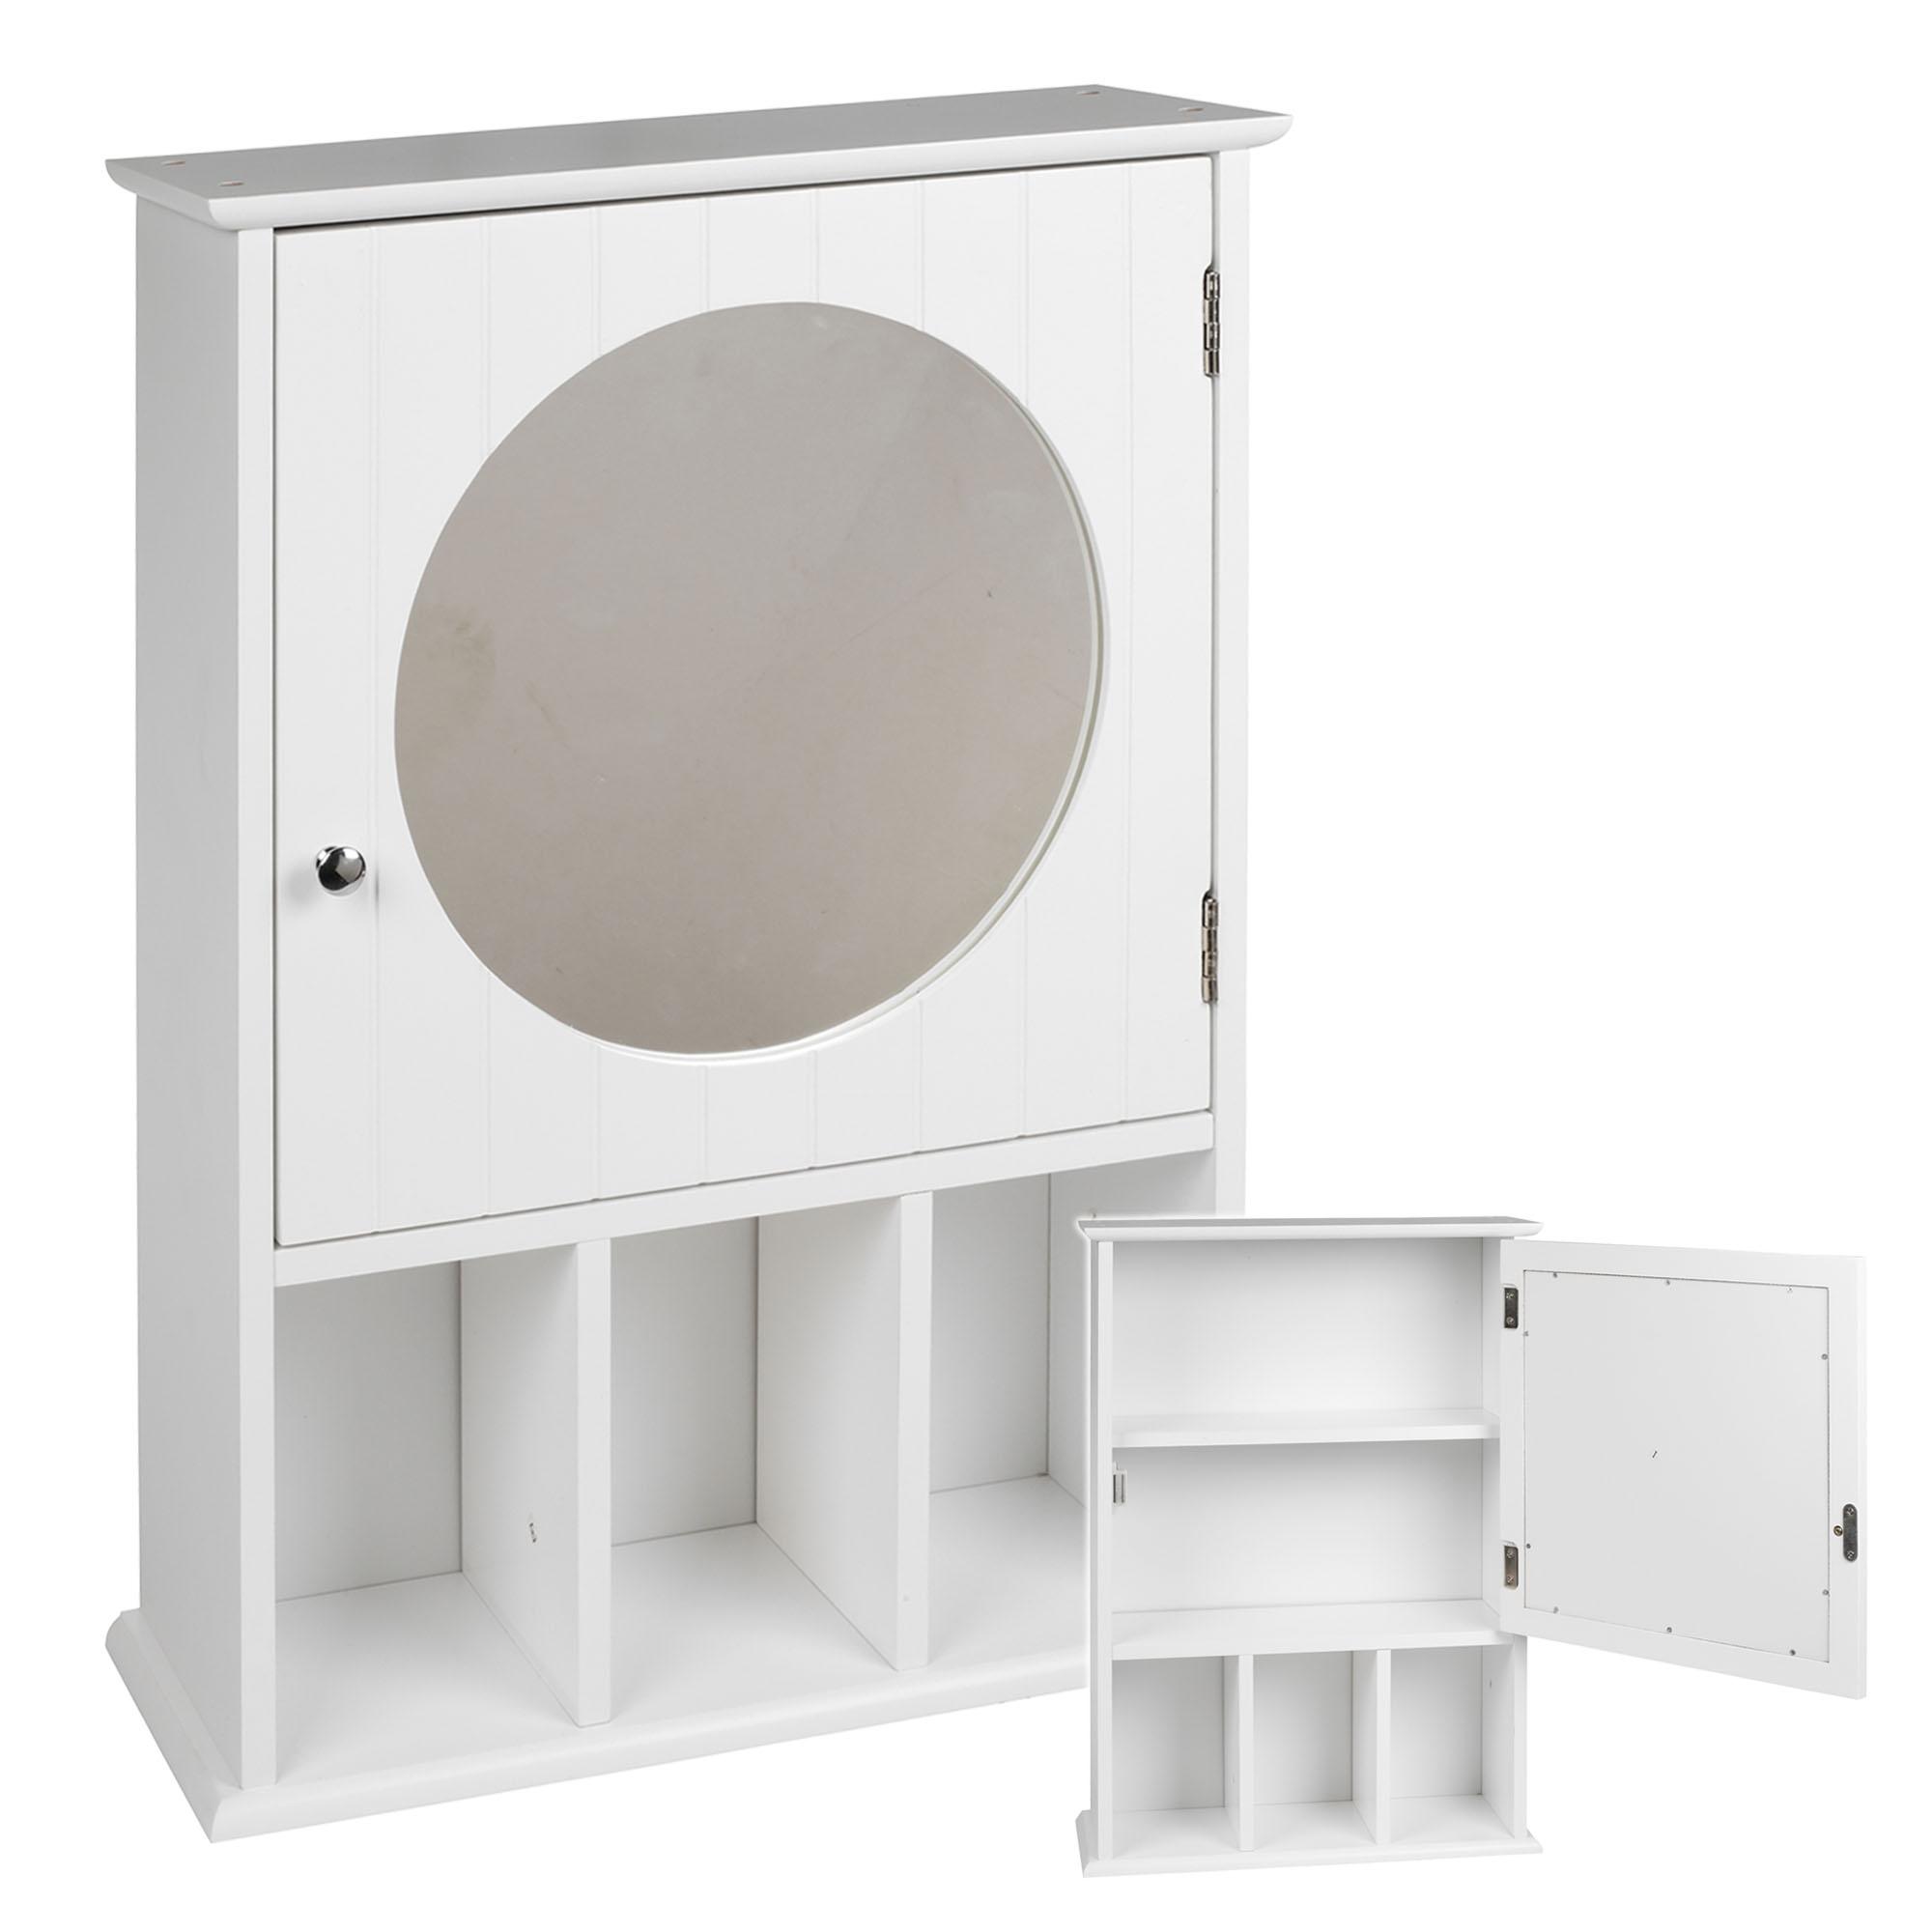 Bathroom Cabinets Double Sided Mirror Doors